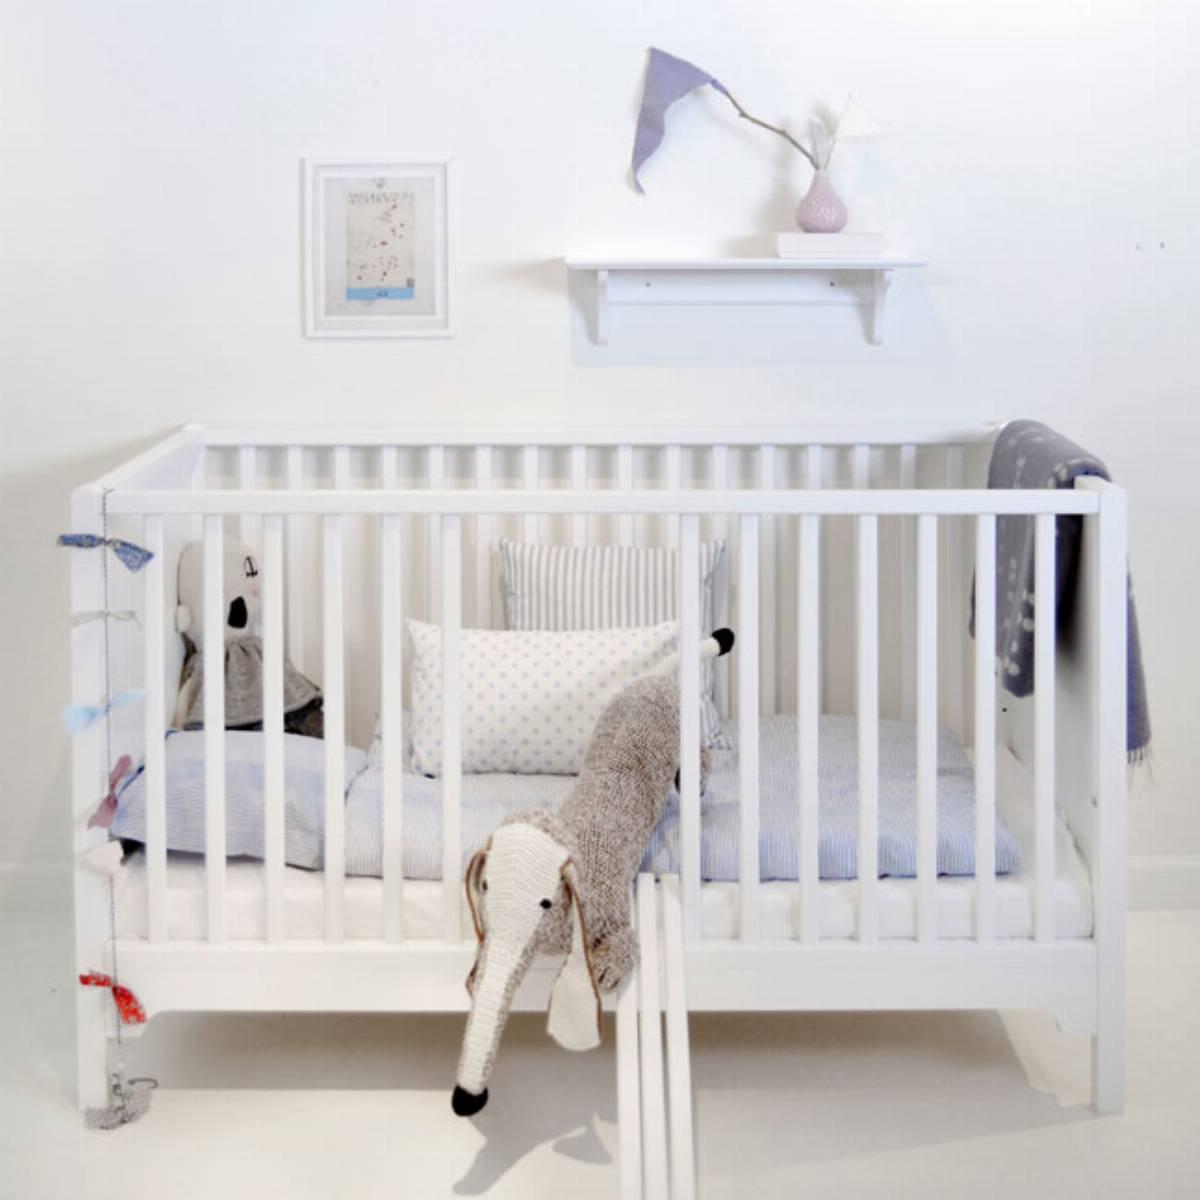 Pokoj dla dziecka - Scandinavian Living (1)